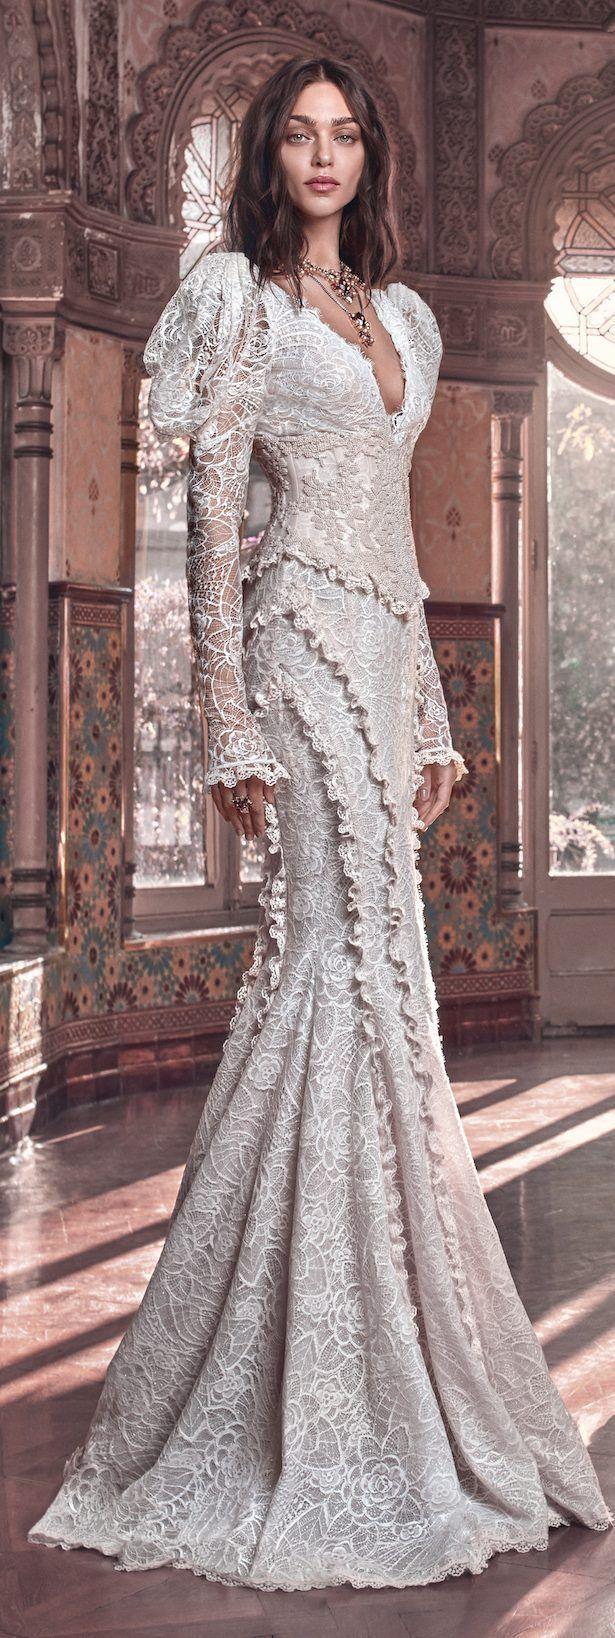 Sheath Wedding Dress : Picture Description Galia Lahav Wedding Dress Collection 2018- Victorian Affinity - #Sheath https://weddinglande.com/dresses/sheath/sheath-wedding-dress-galia-lahav-wedding-dress-collection-2018-victorian-affinity/